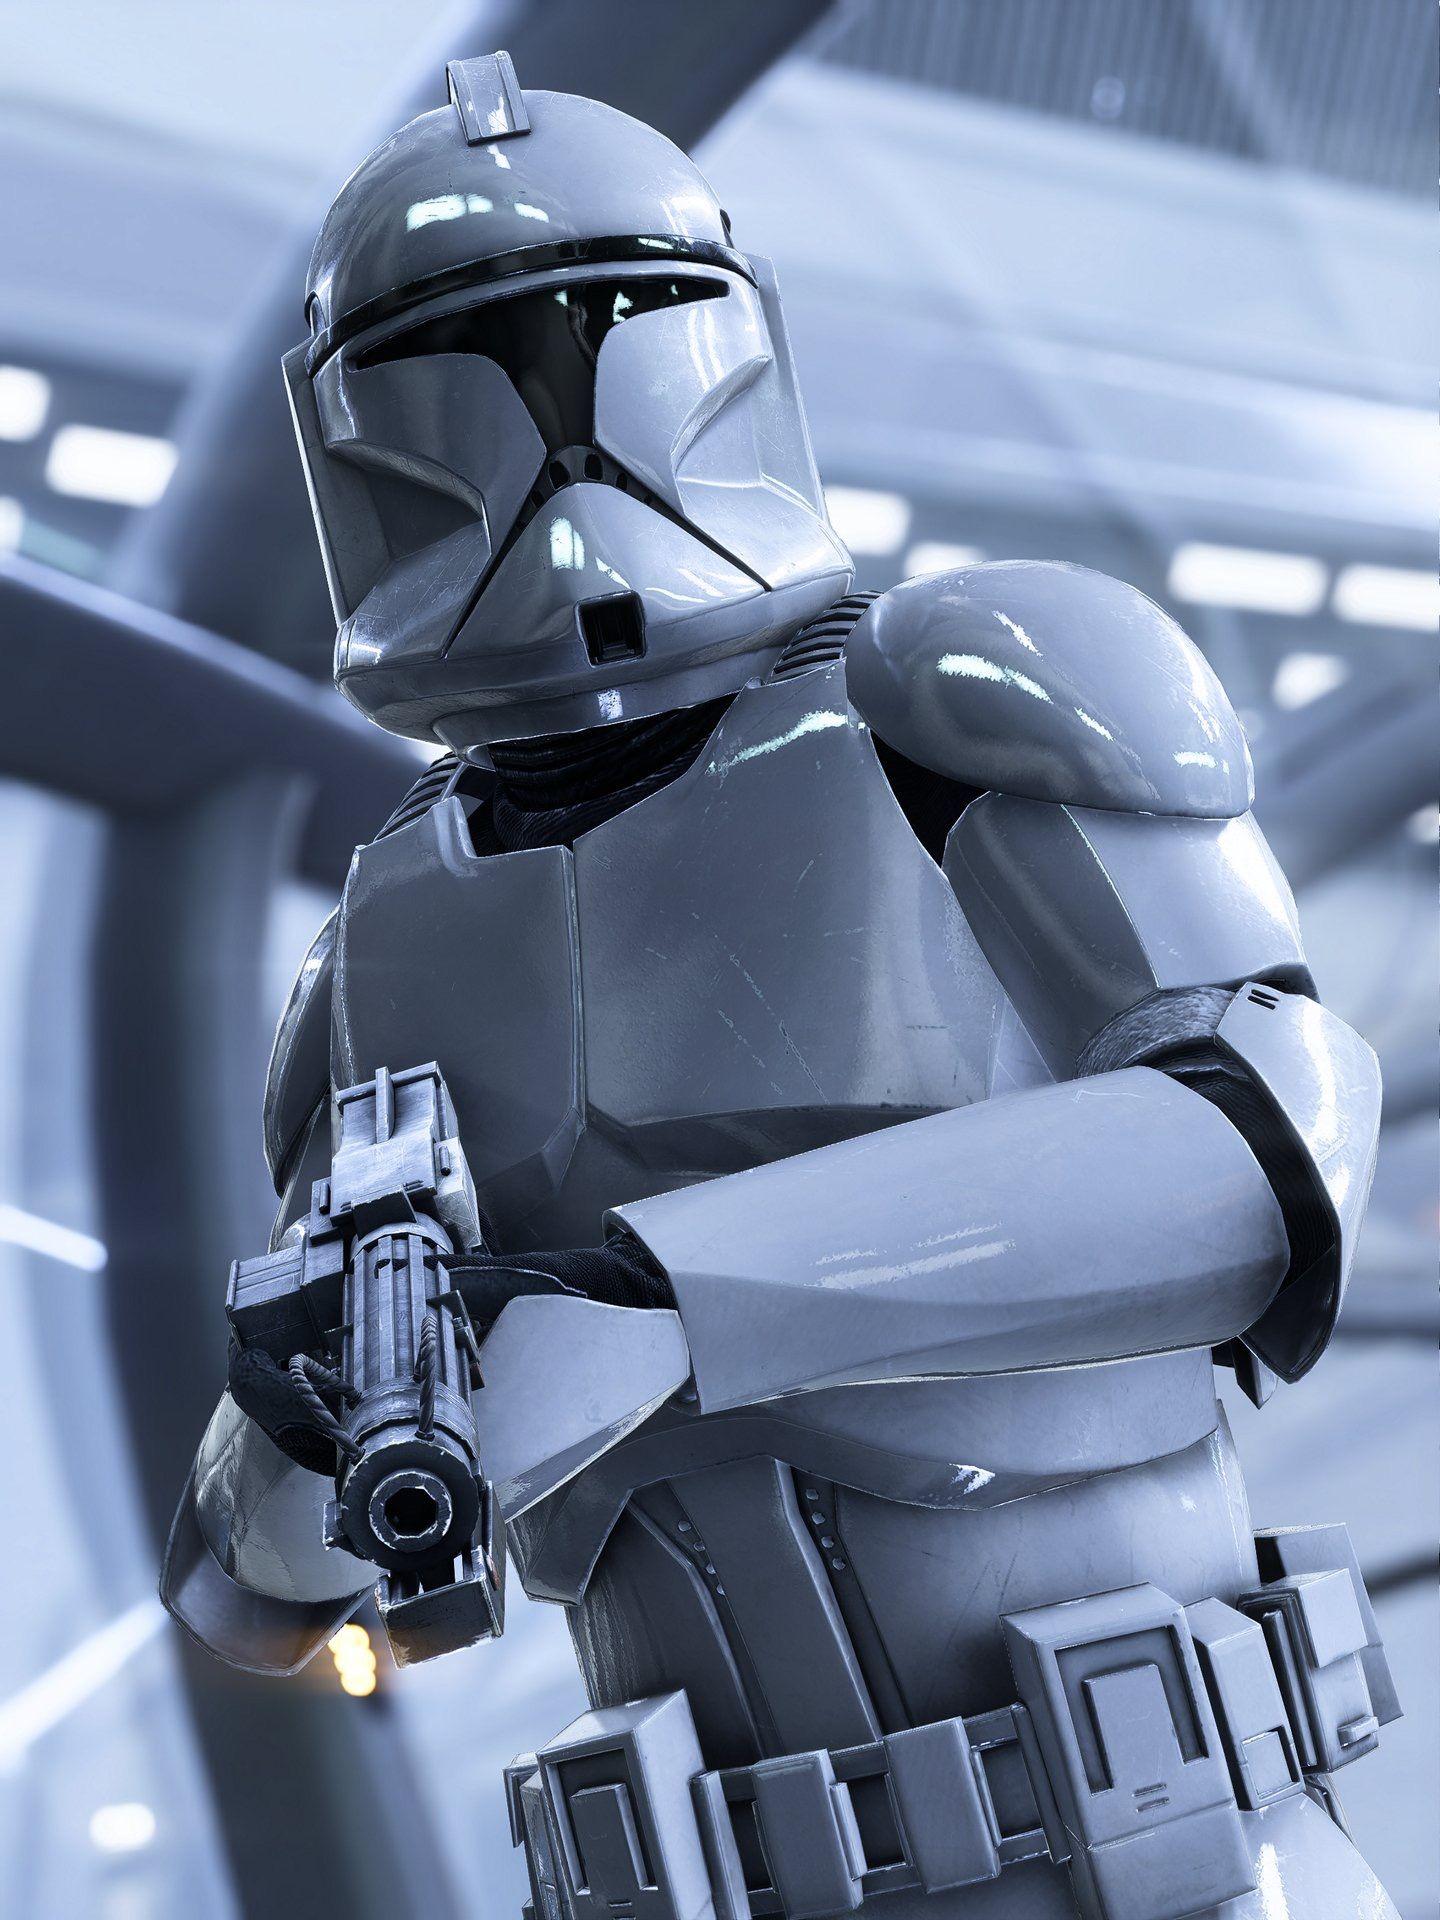 Battlefront 2 Clone Assault Specialised Trooper Star Wars Images Star Wars Ships Star Wars Pictures